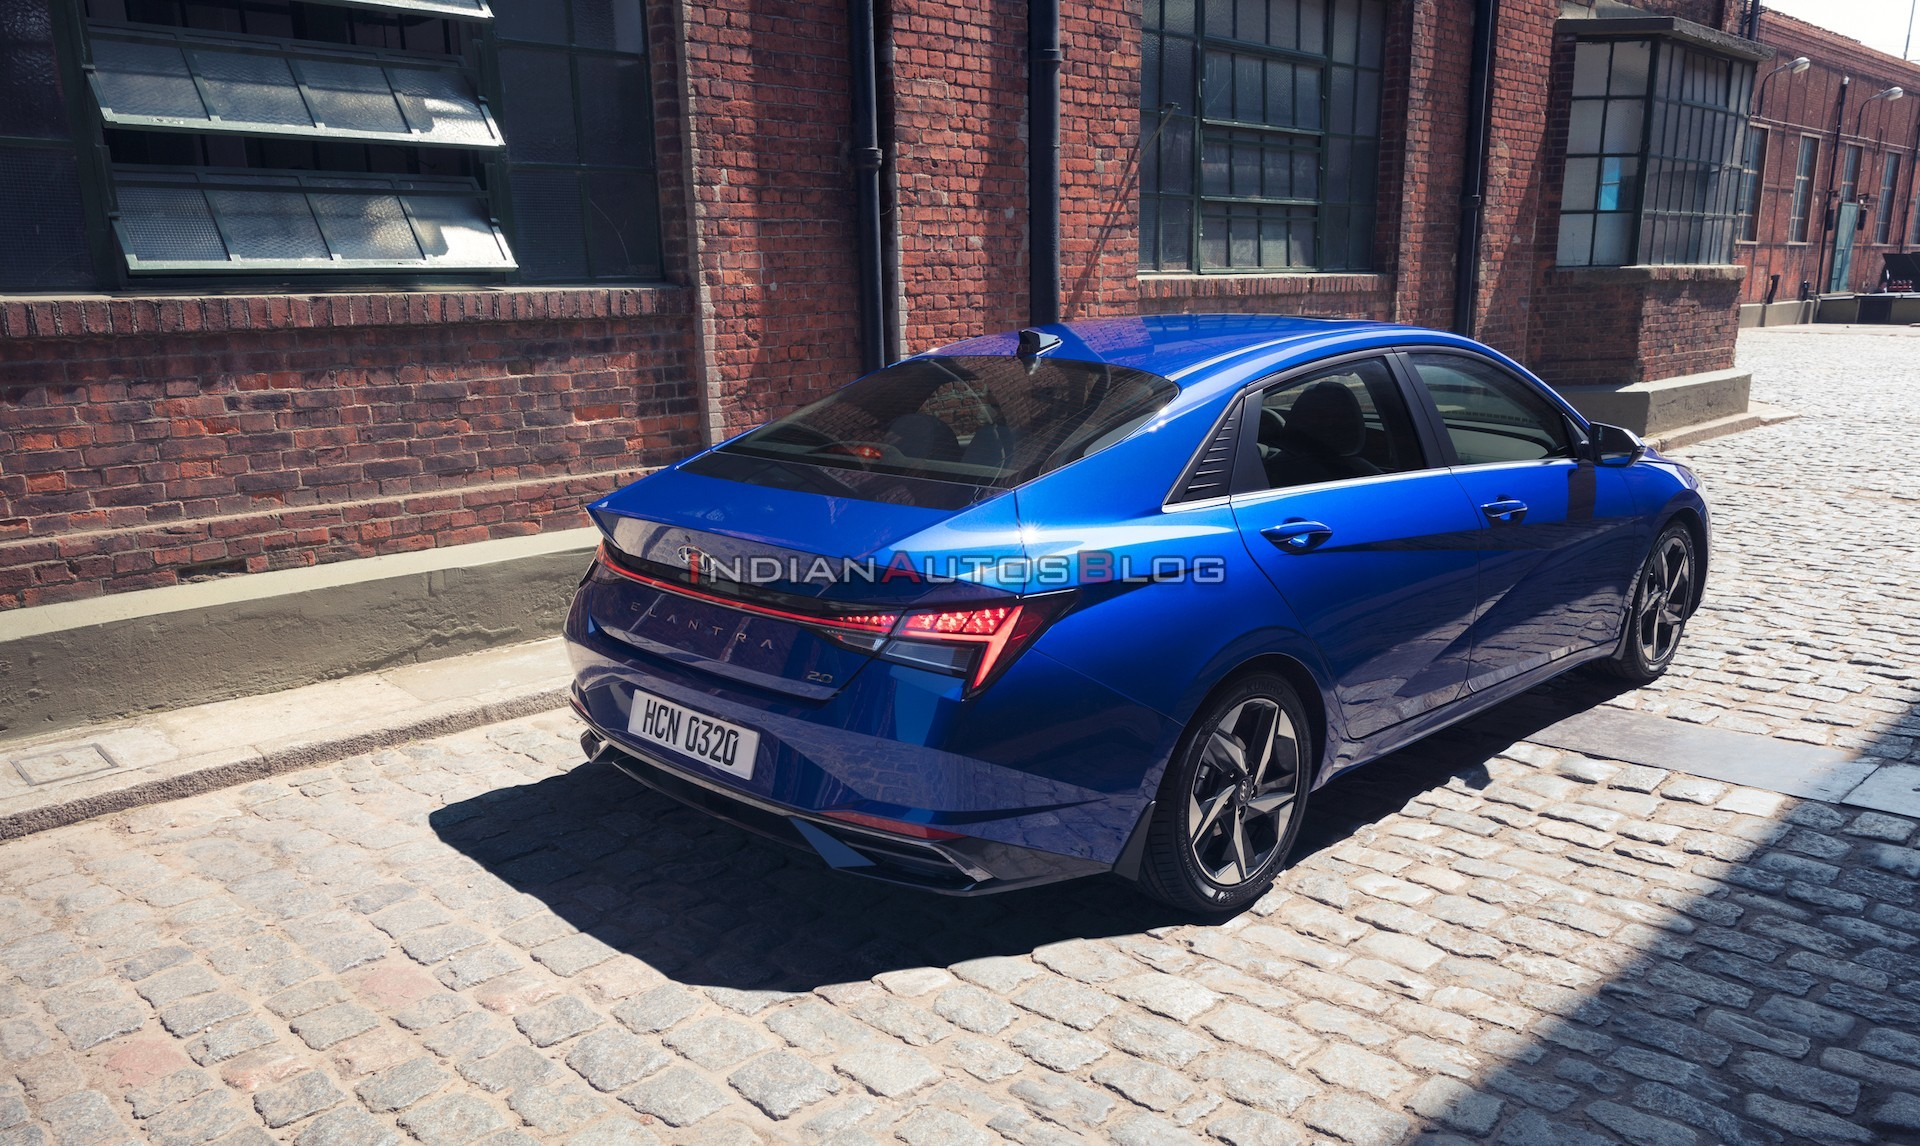 2021-hyundai-elantra-blue-rear-three-quarters-4538.jpg